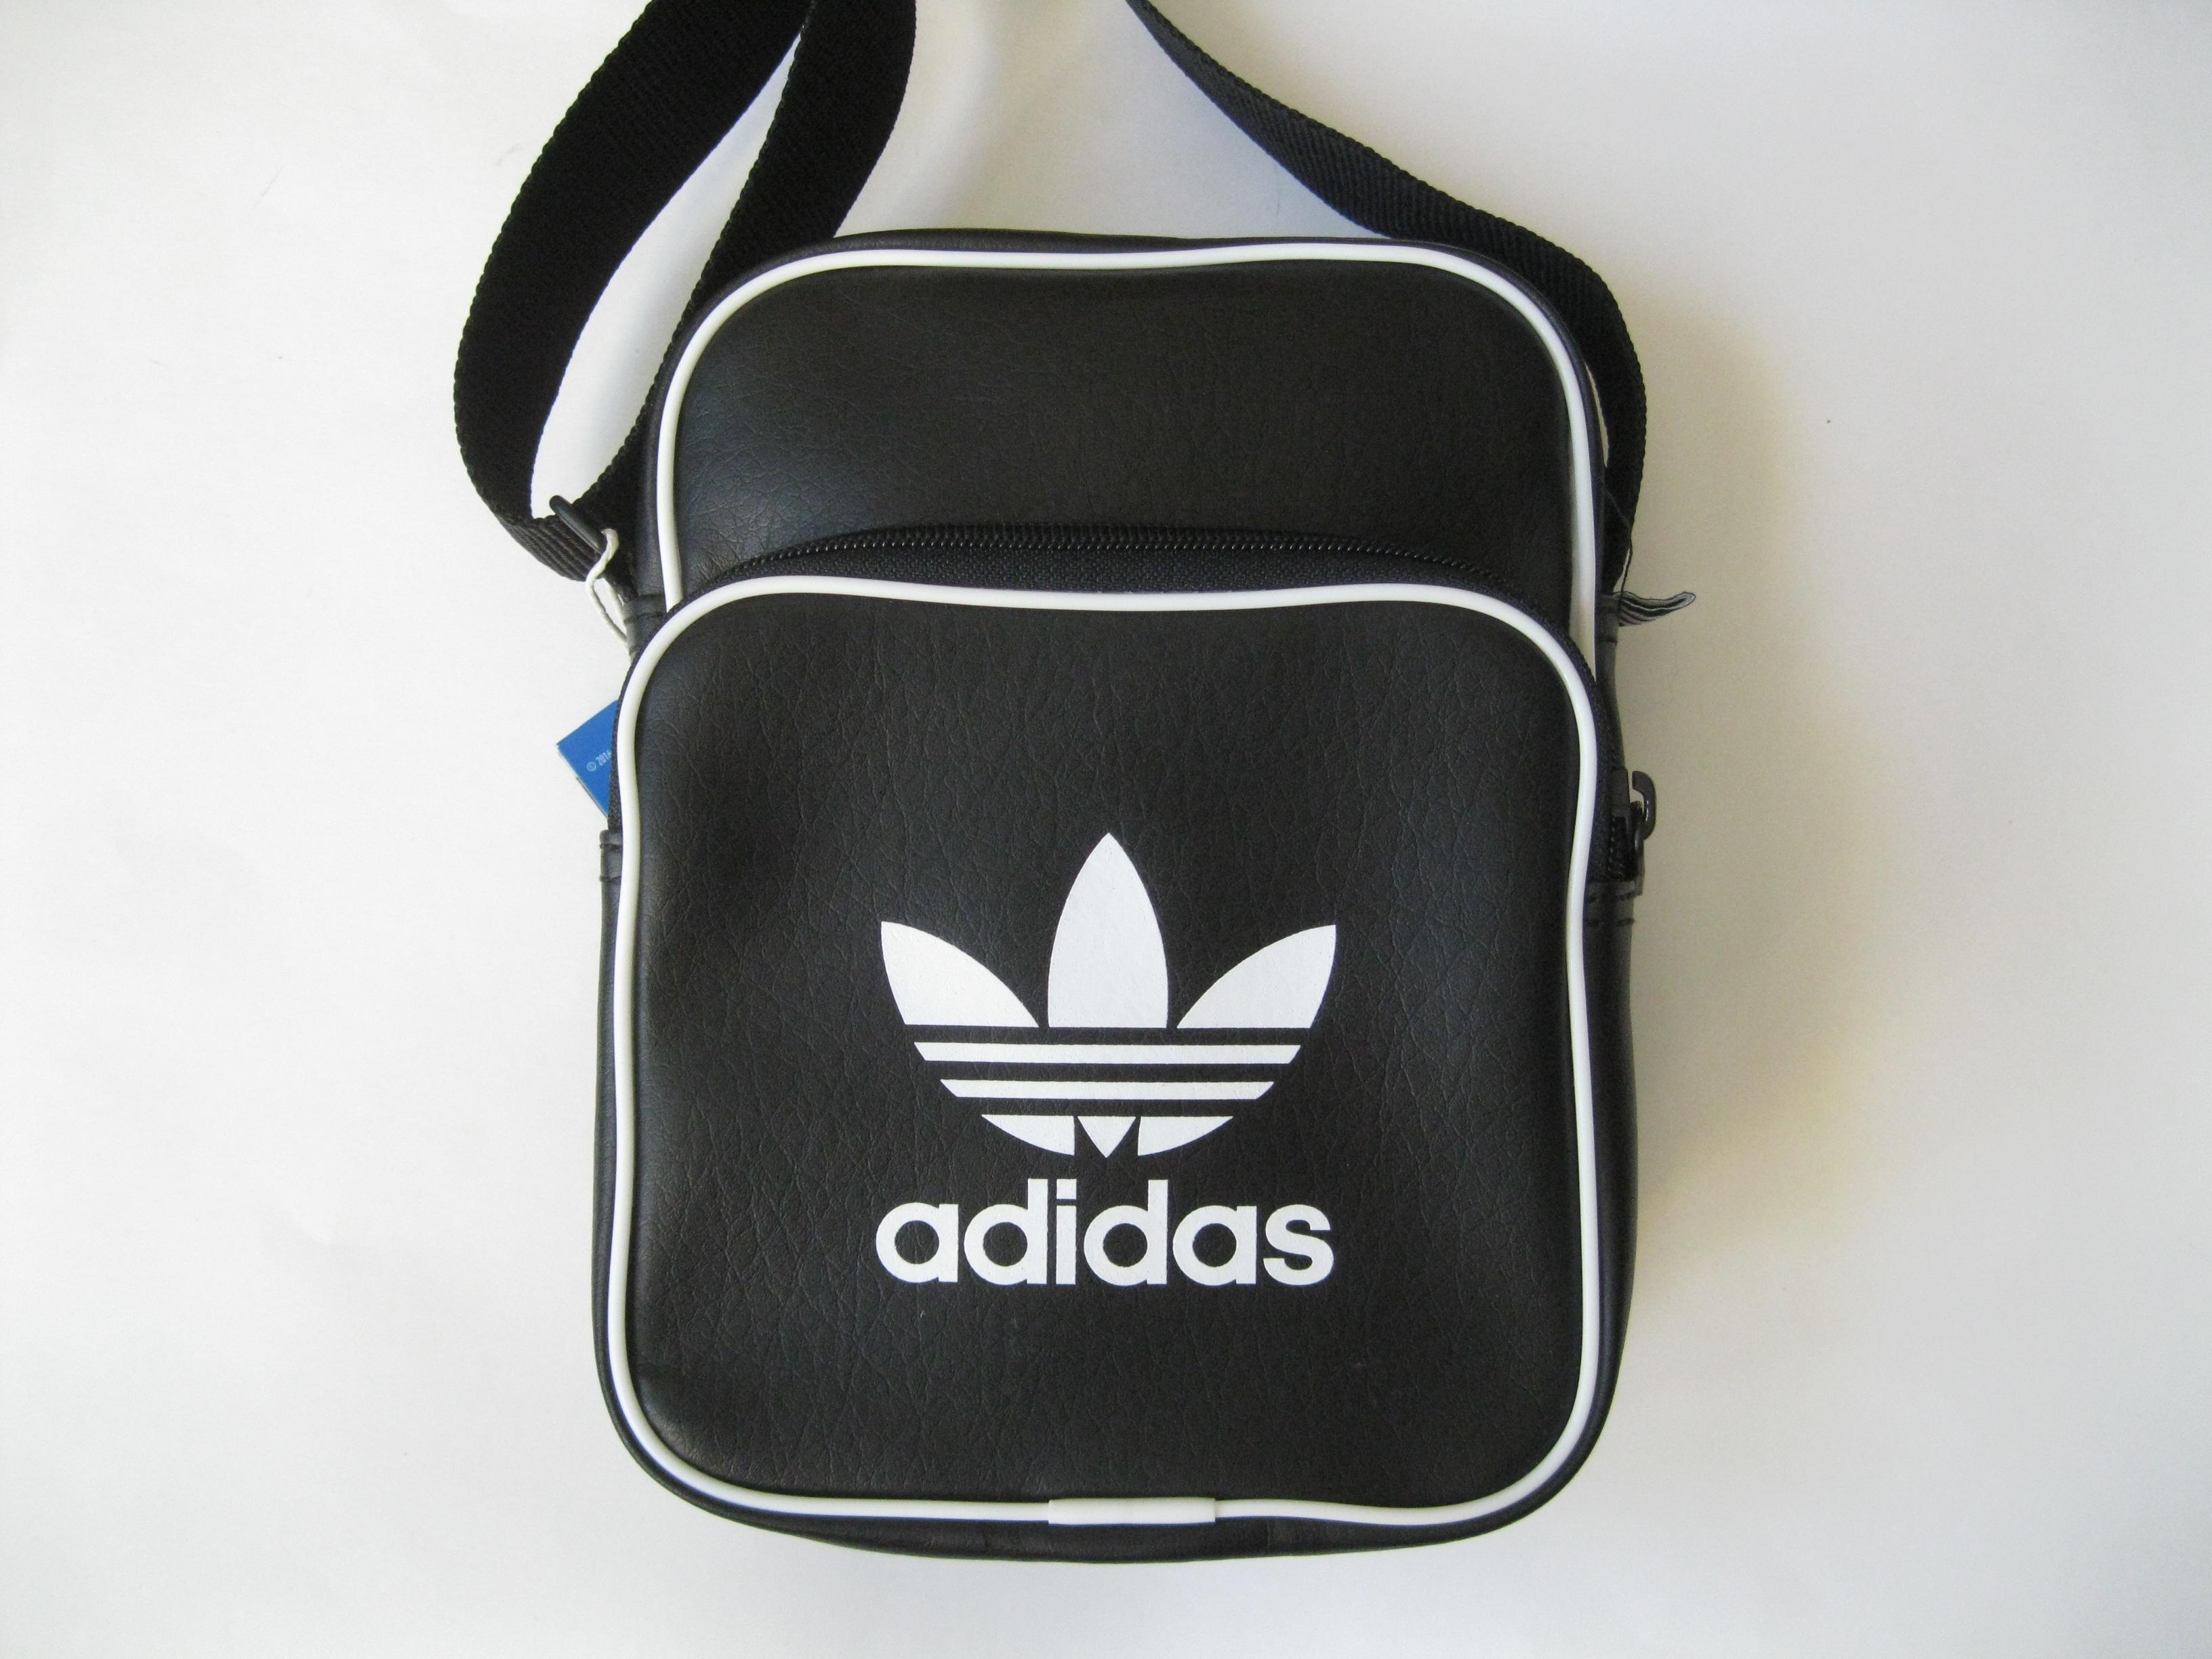 e680775e251e Adidas Classic Mini Shoulder Bag Black Size one size - Bags   Luggage for  Sale - Grailed